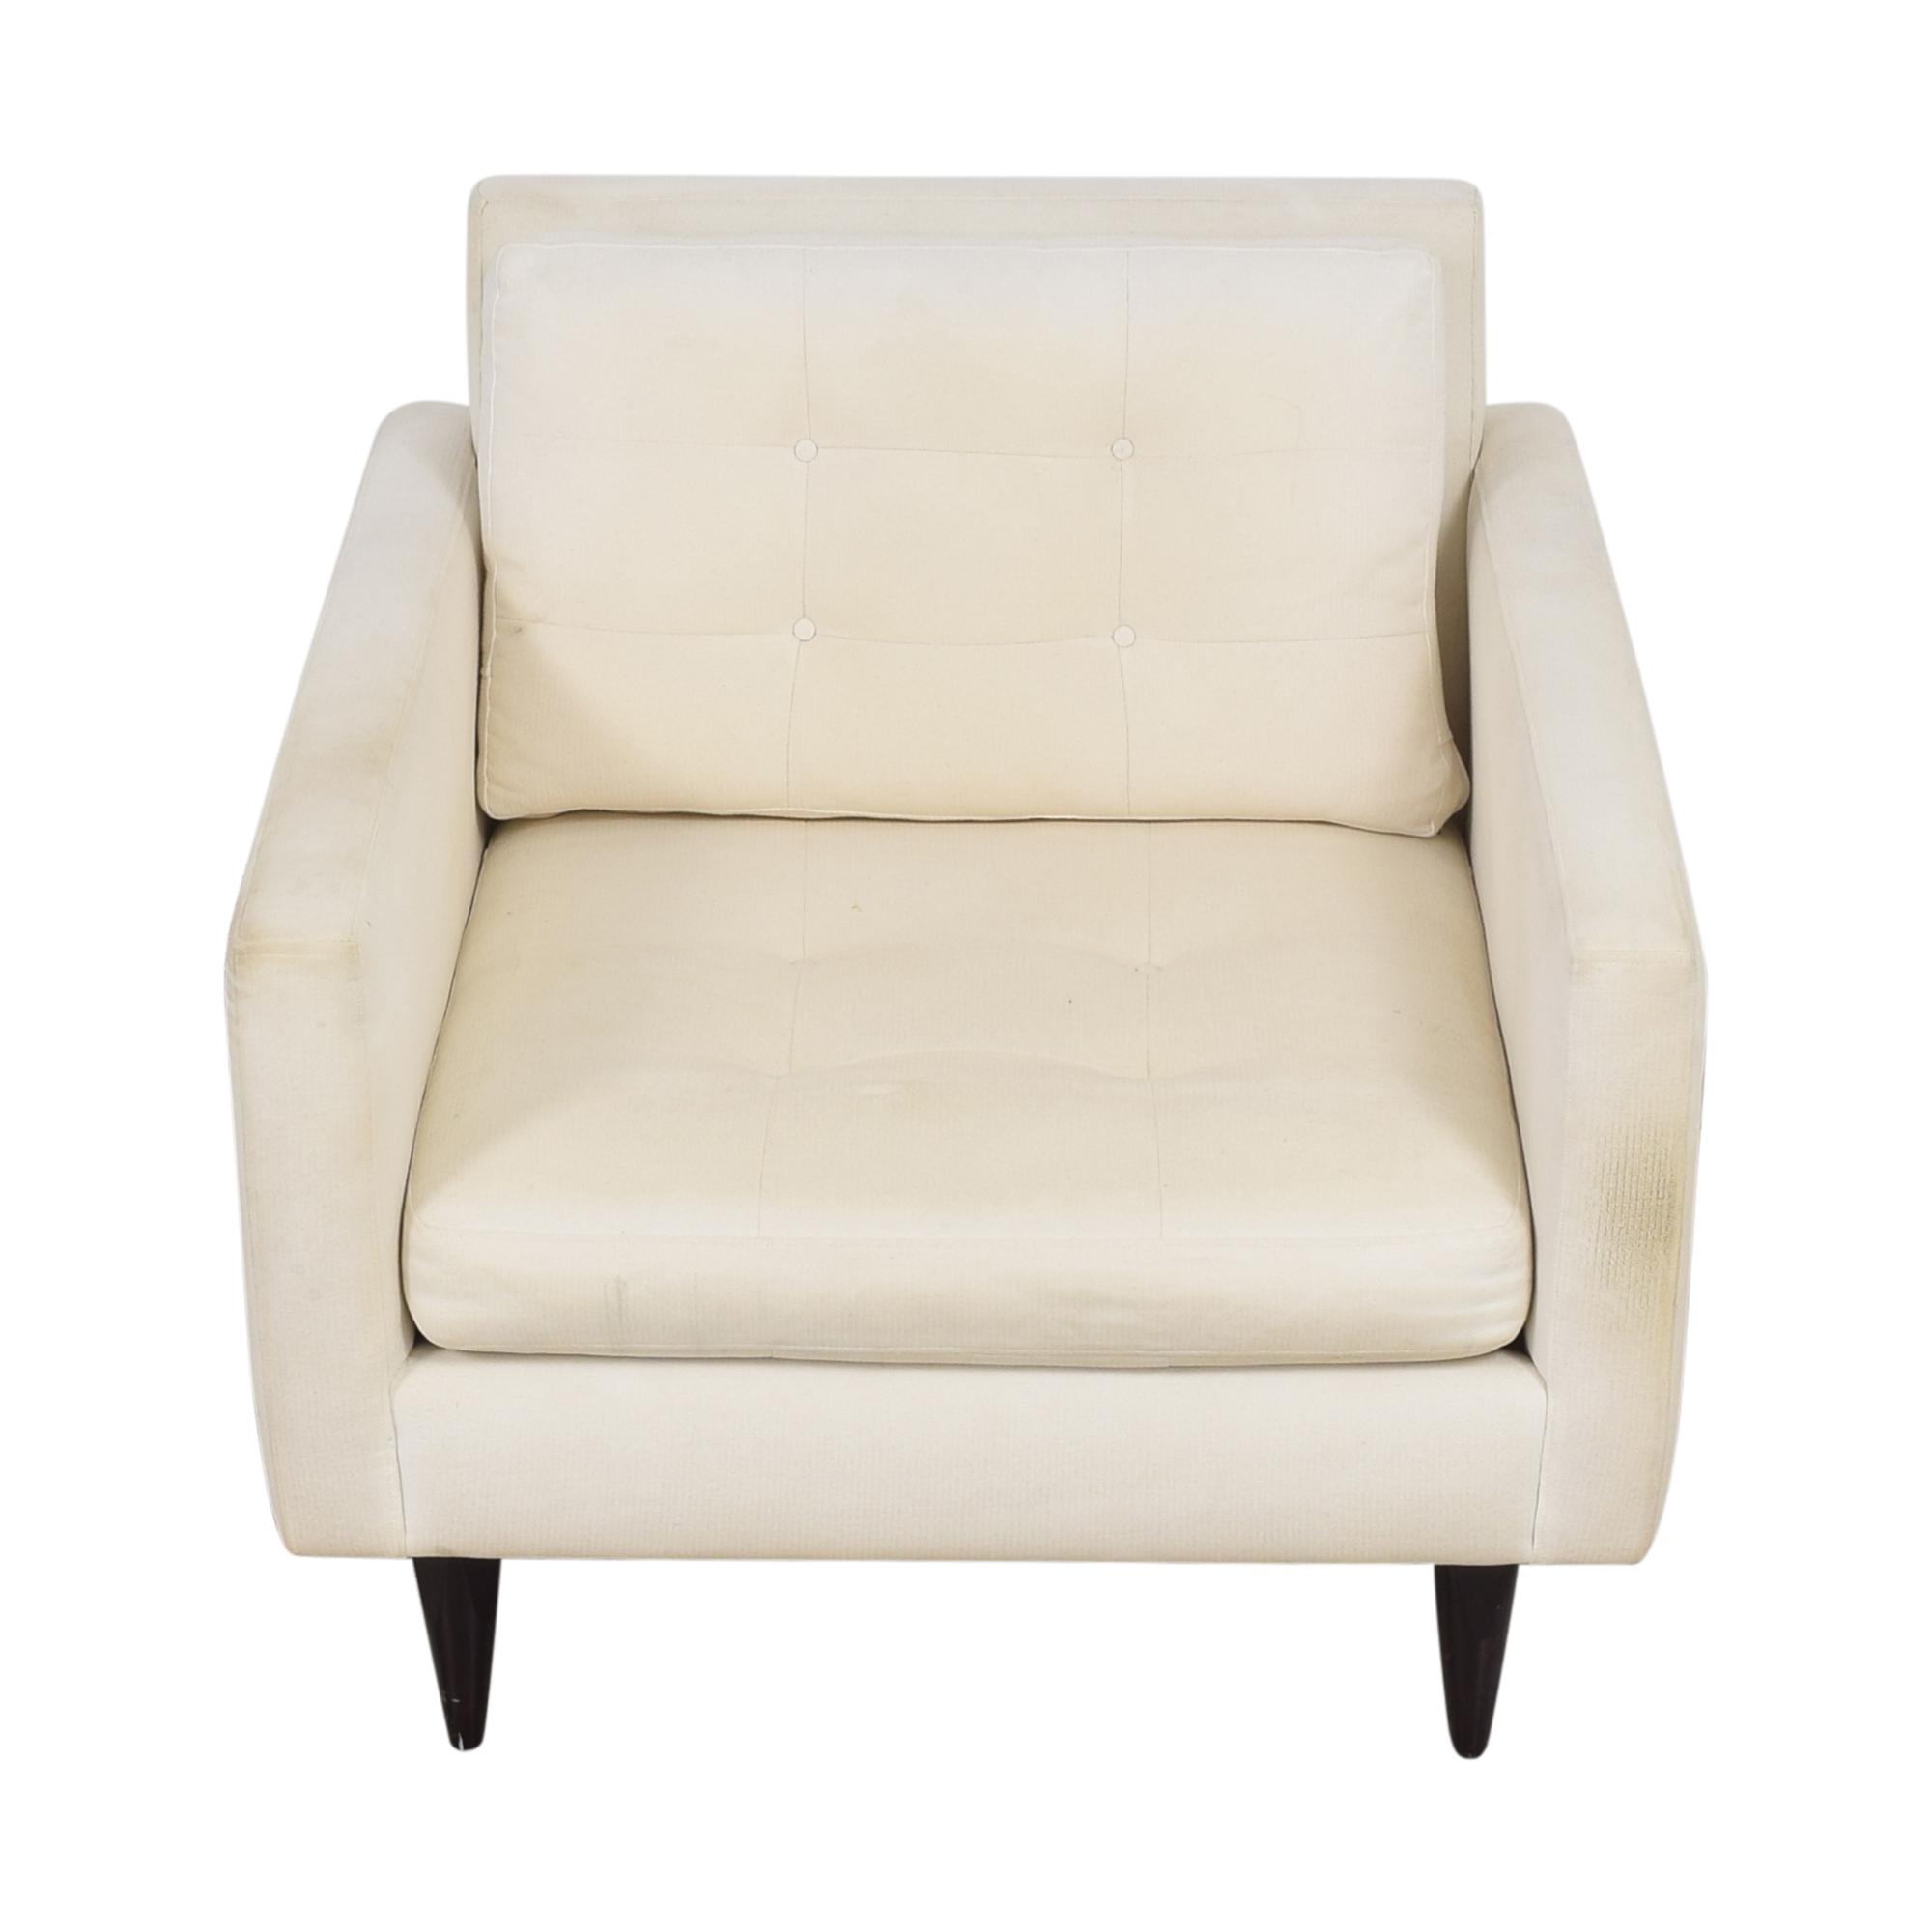 Crate & Barrel Crate & Barrel Petrie Midcentury Chair discount